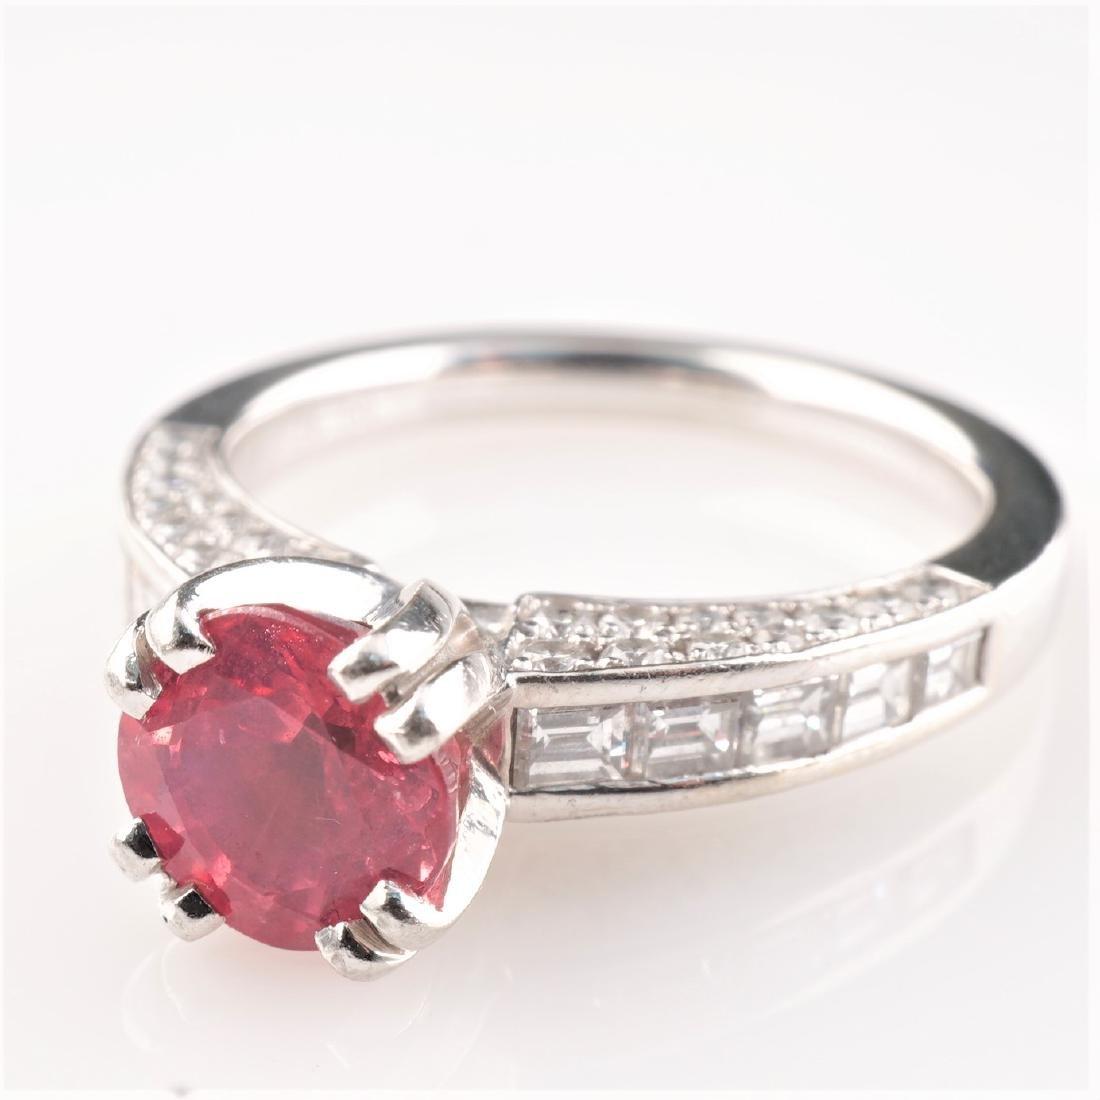 Natural Pink Spinel & Diamond Ring in Platinum sz 6.5